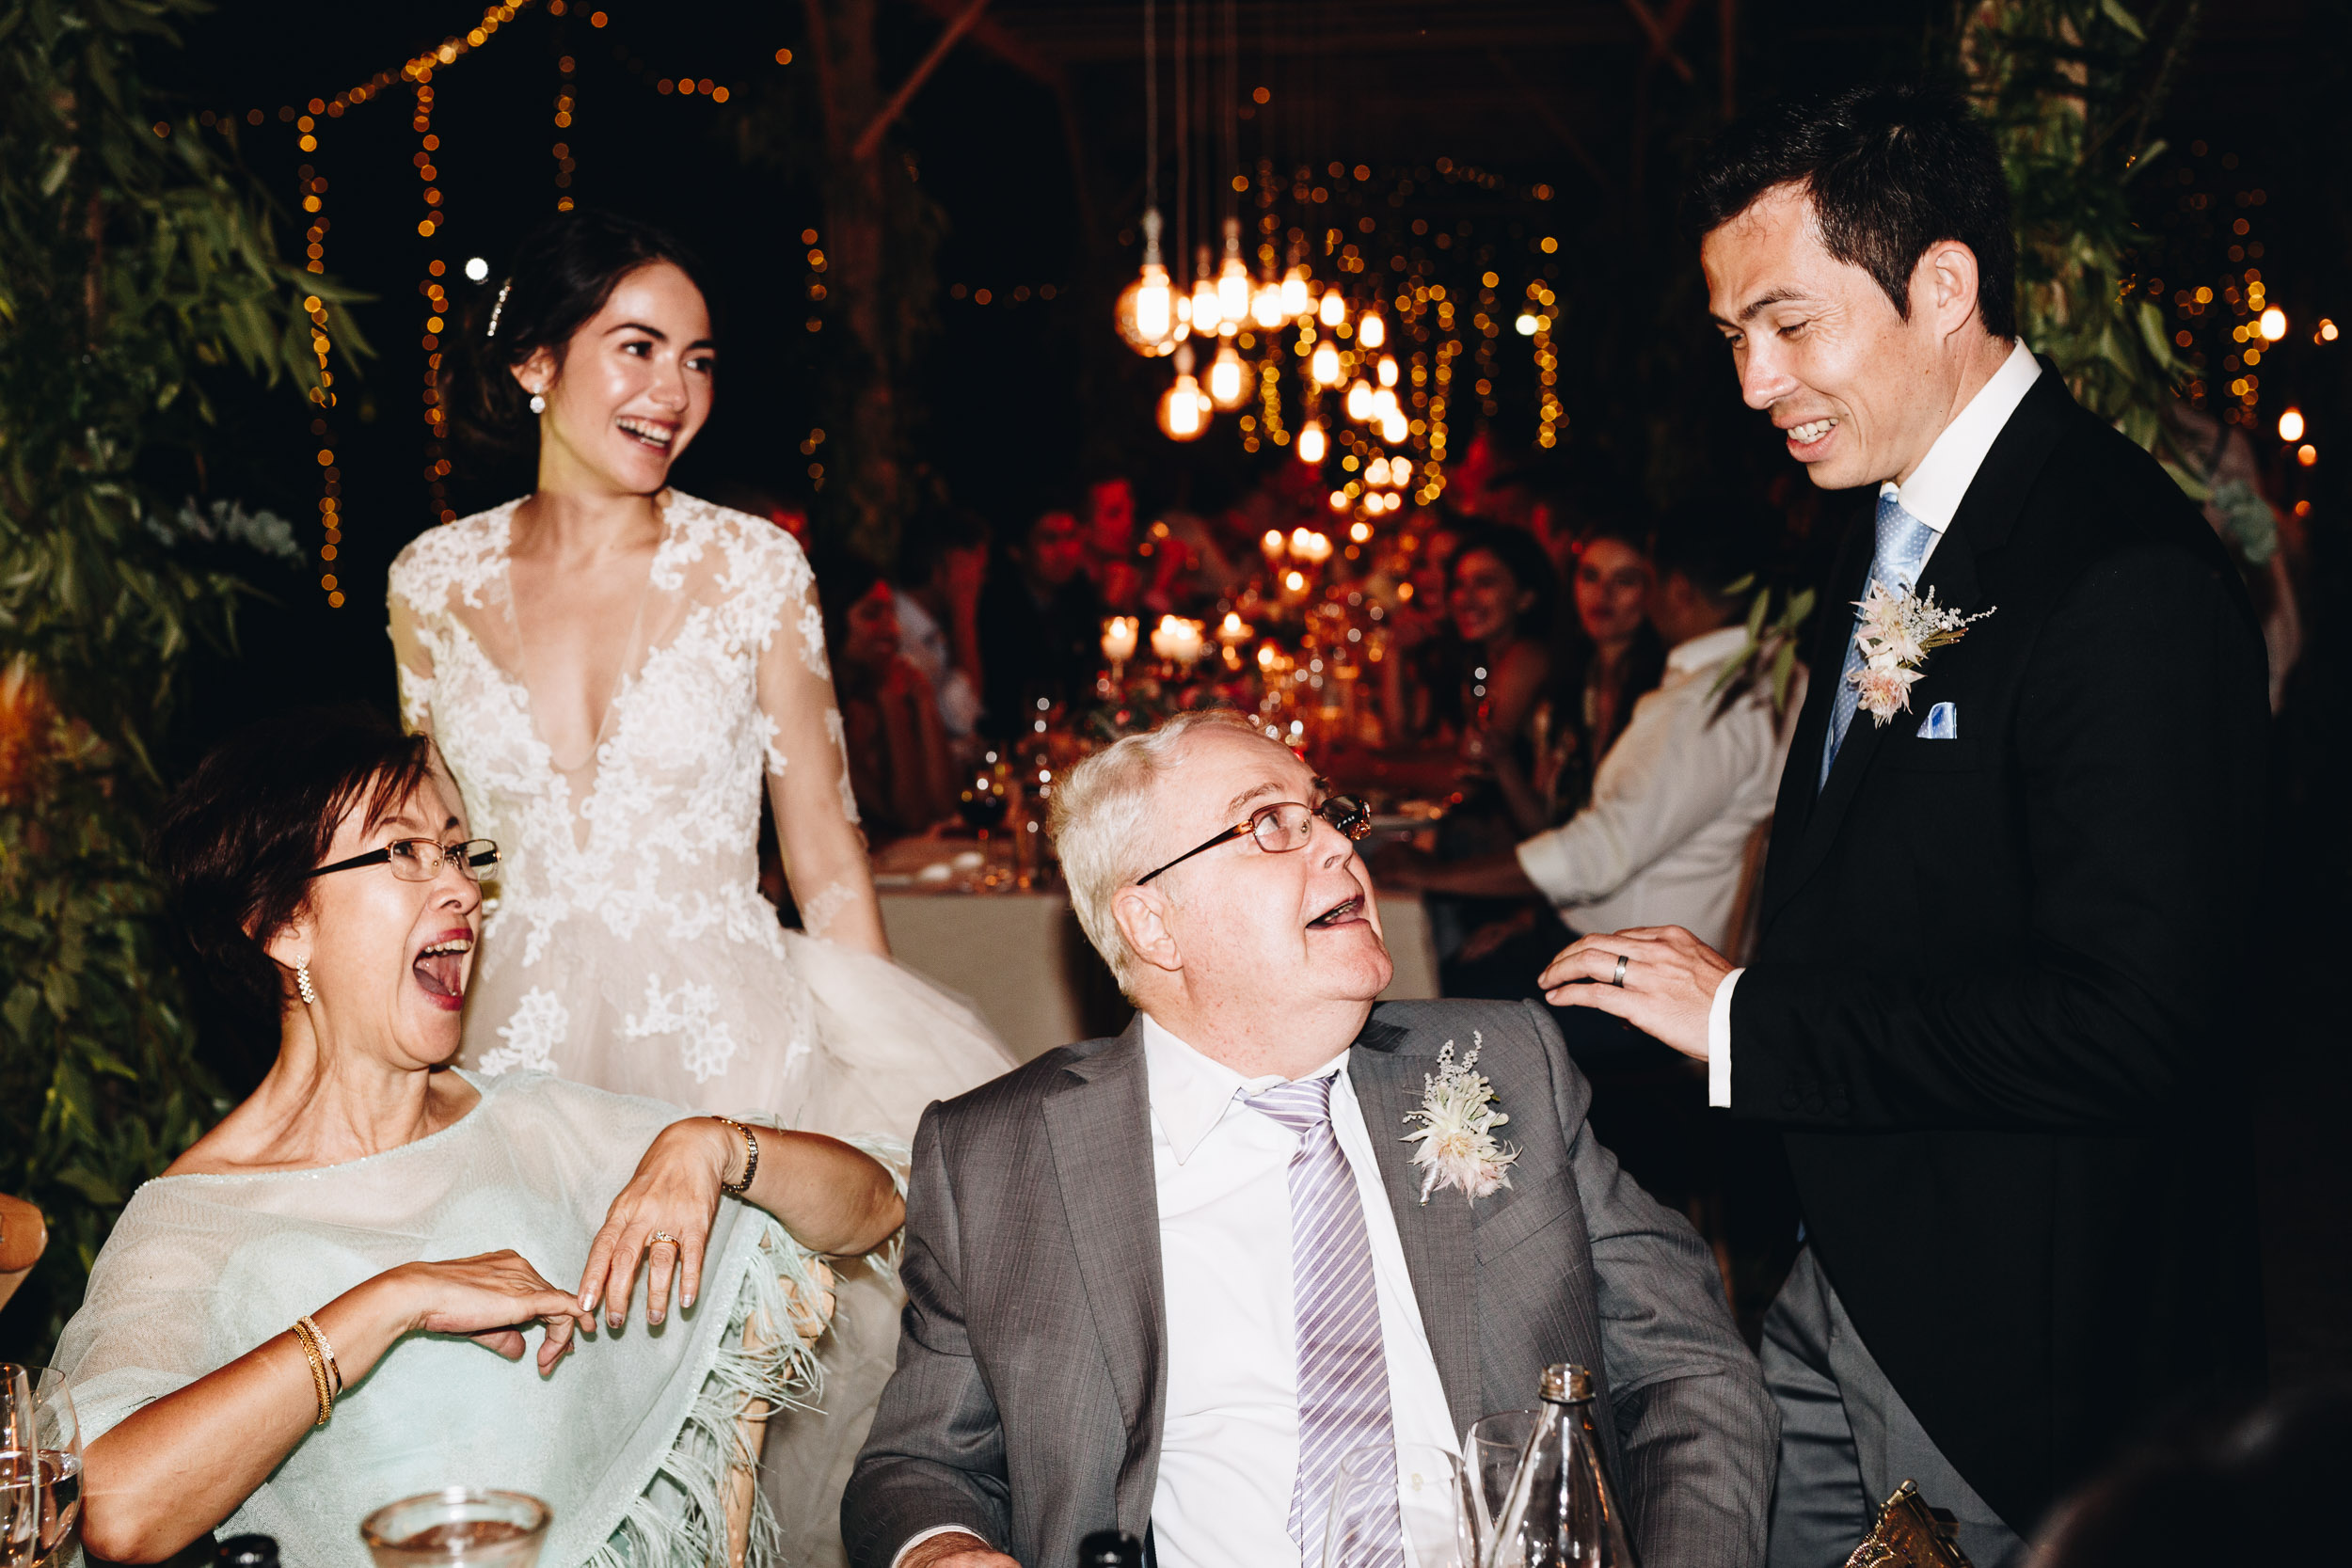 Jenny-Rockett-John-Scranton-Cape-Town-Wedding-Photographer-Andrea-Kellan-221.jpg